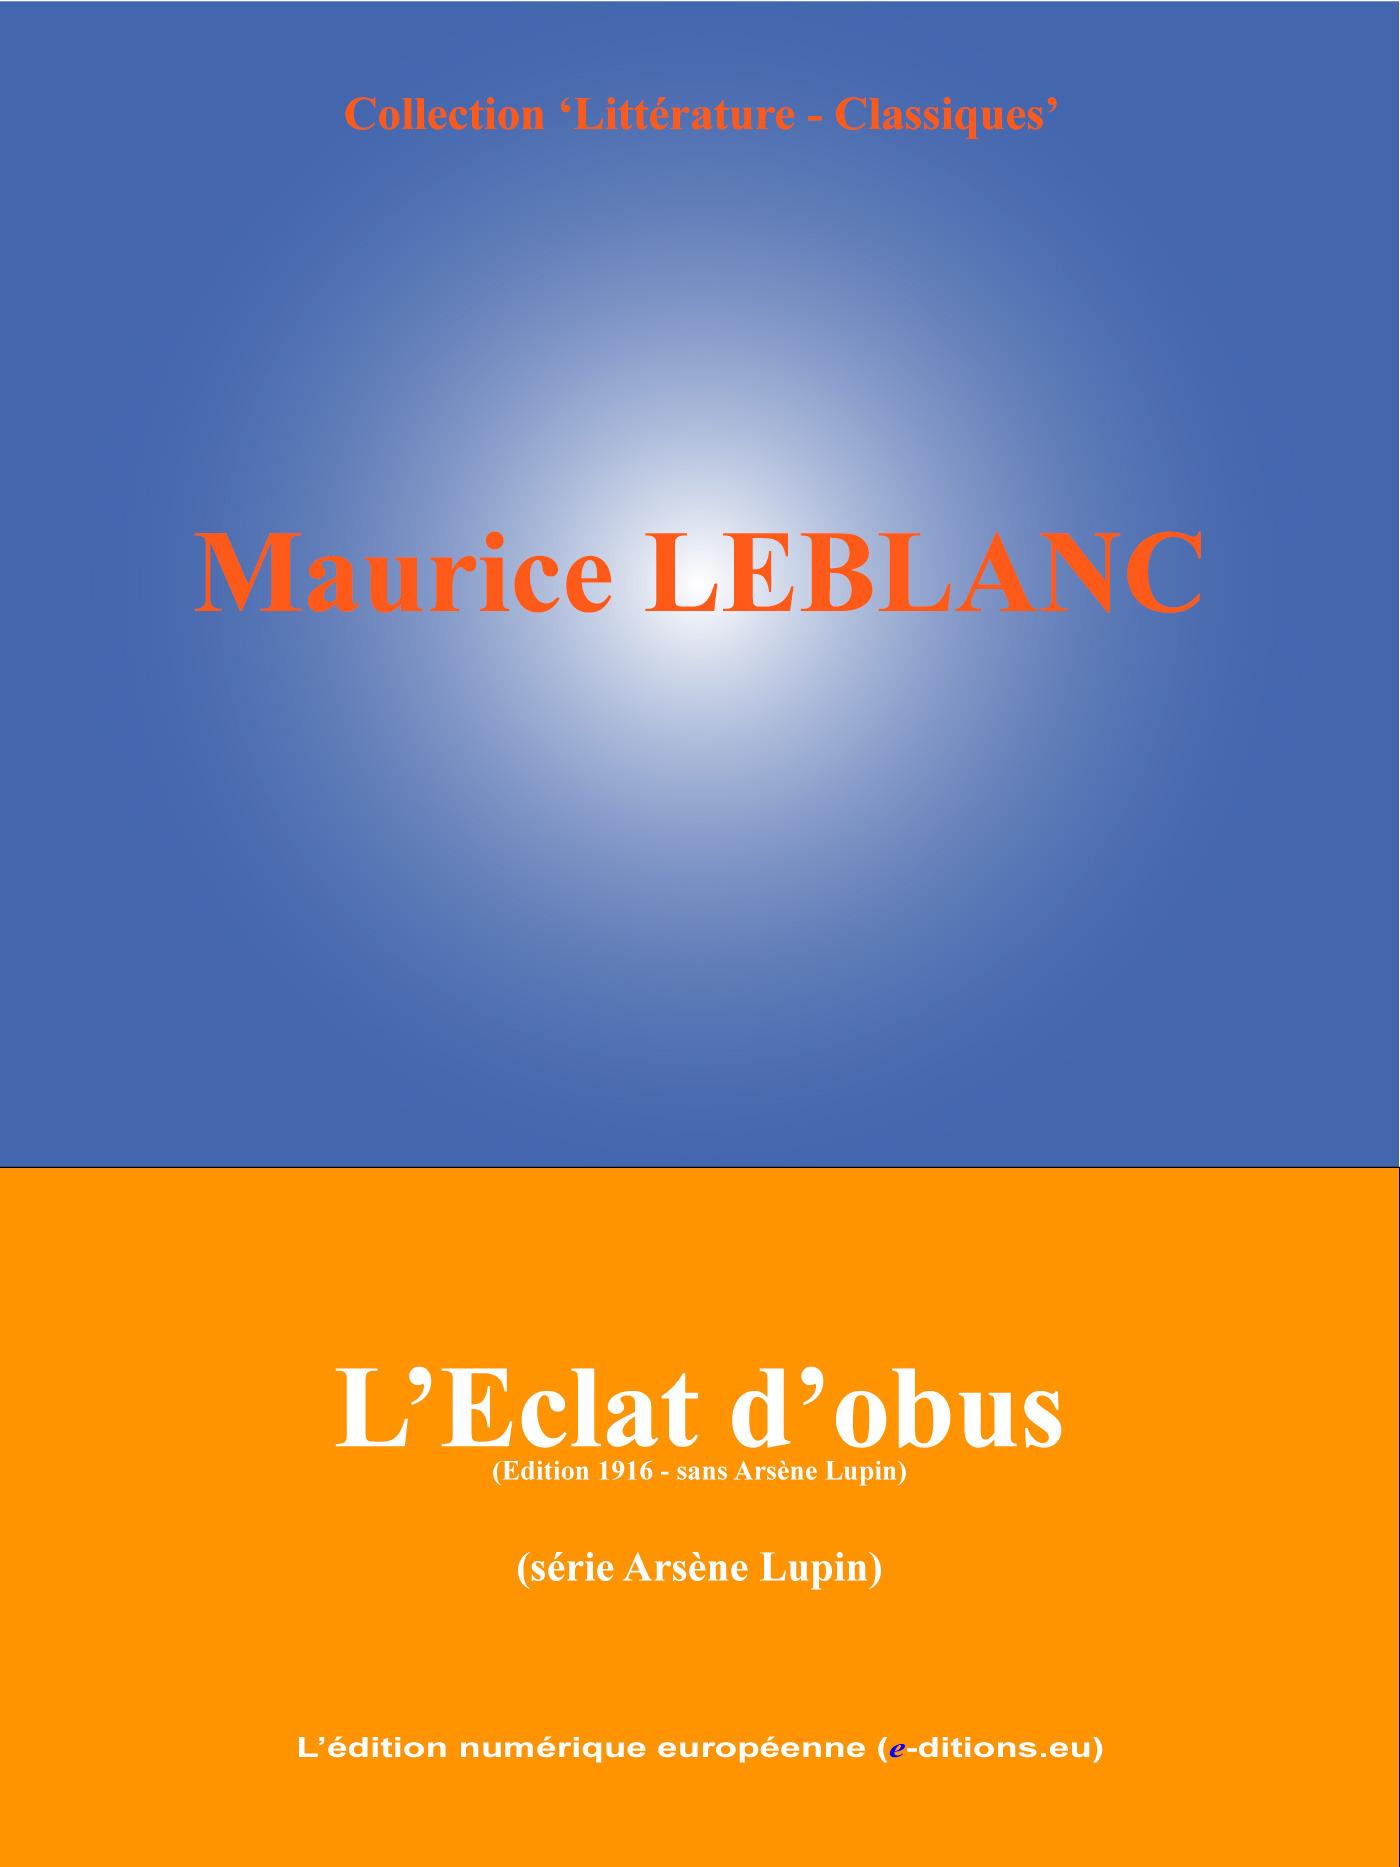 L'Eclat d'obus  - Maurice Leblanc